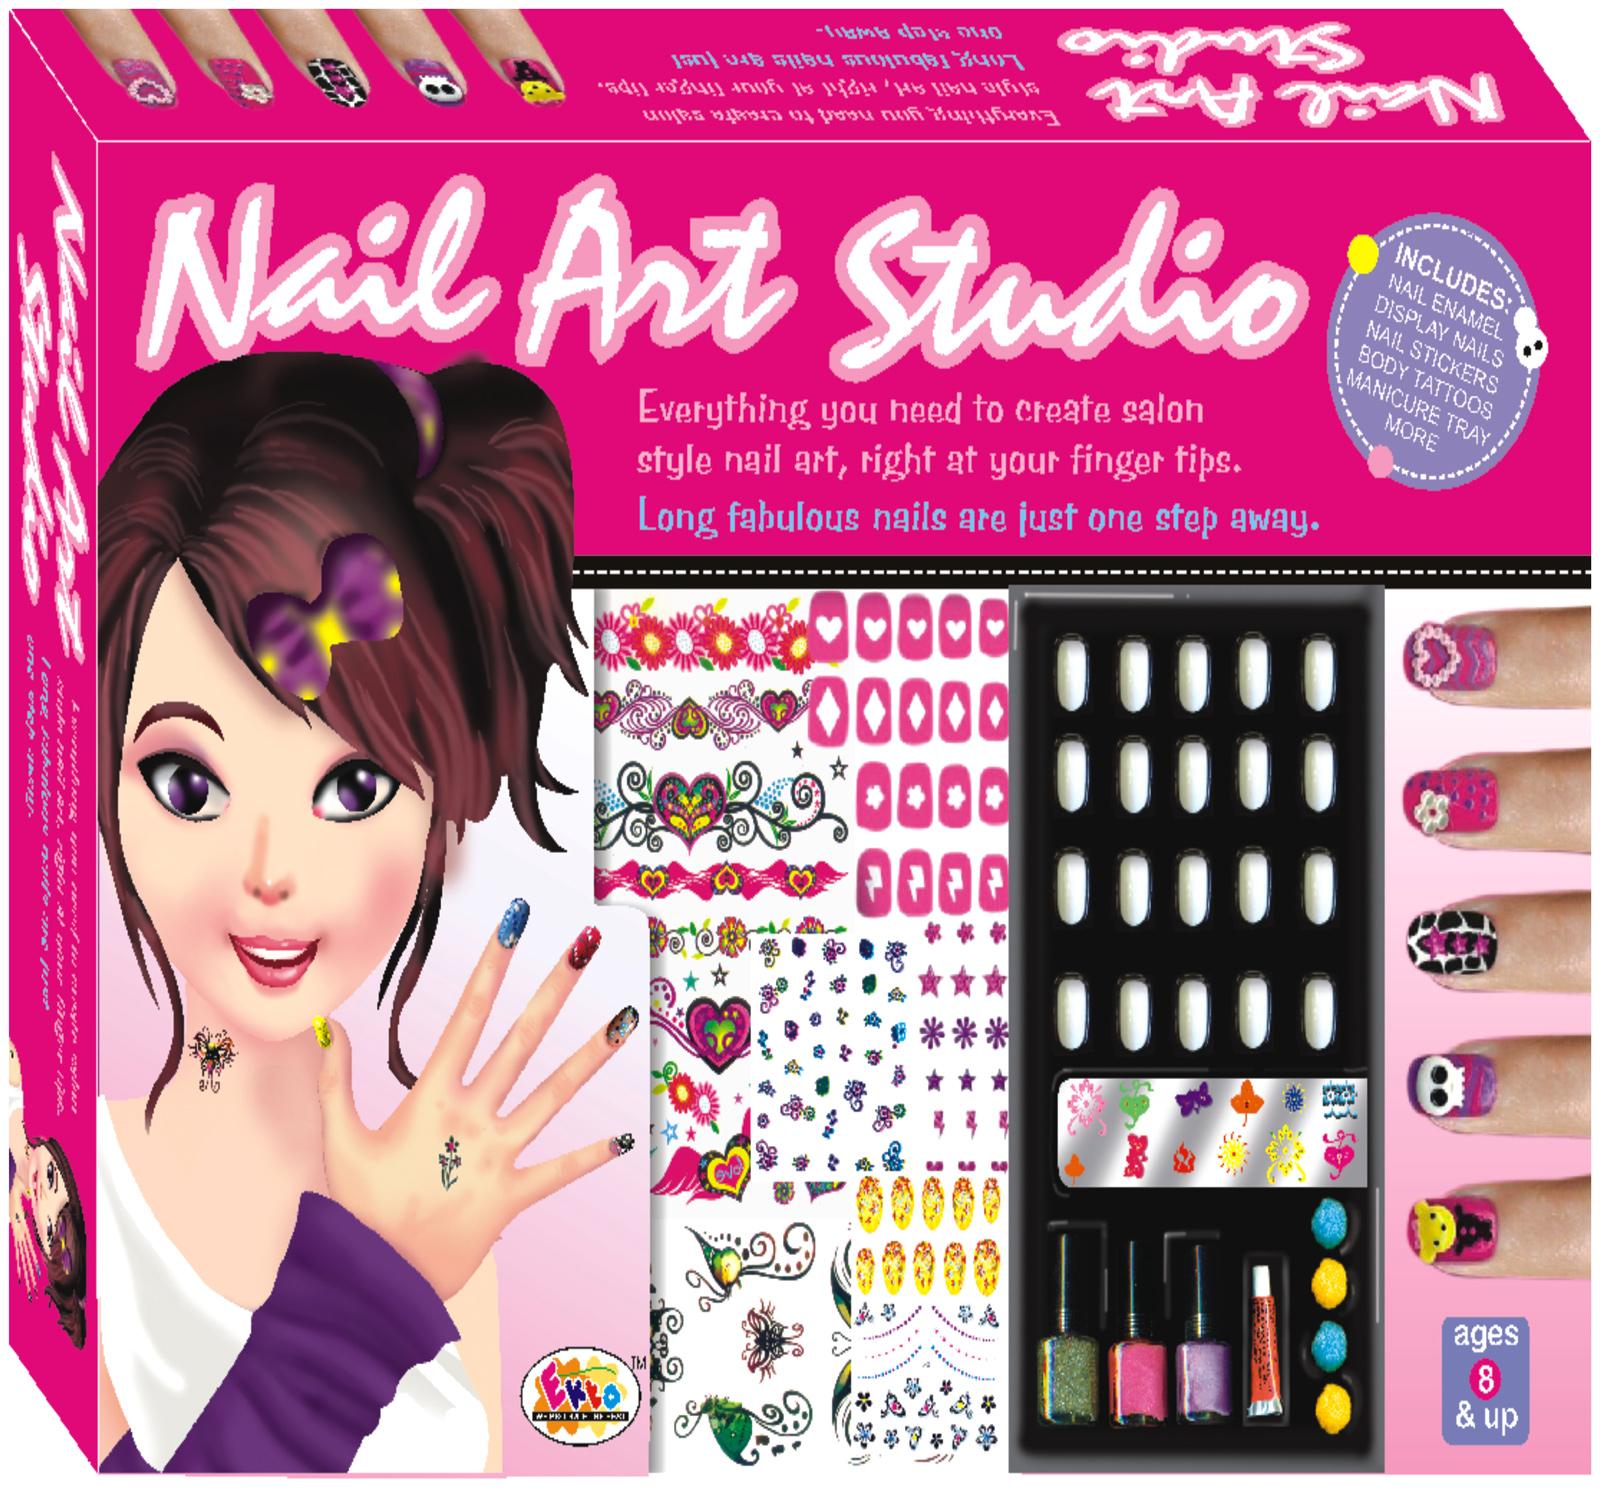 Nail art sets for kids best nails 2018 ekta nail art studio kit 8 years plus india prinsesfo Gallery